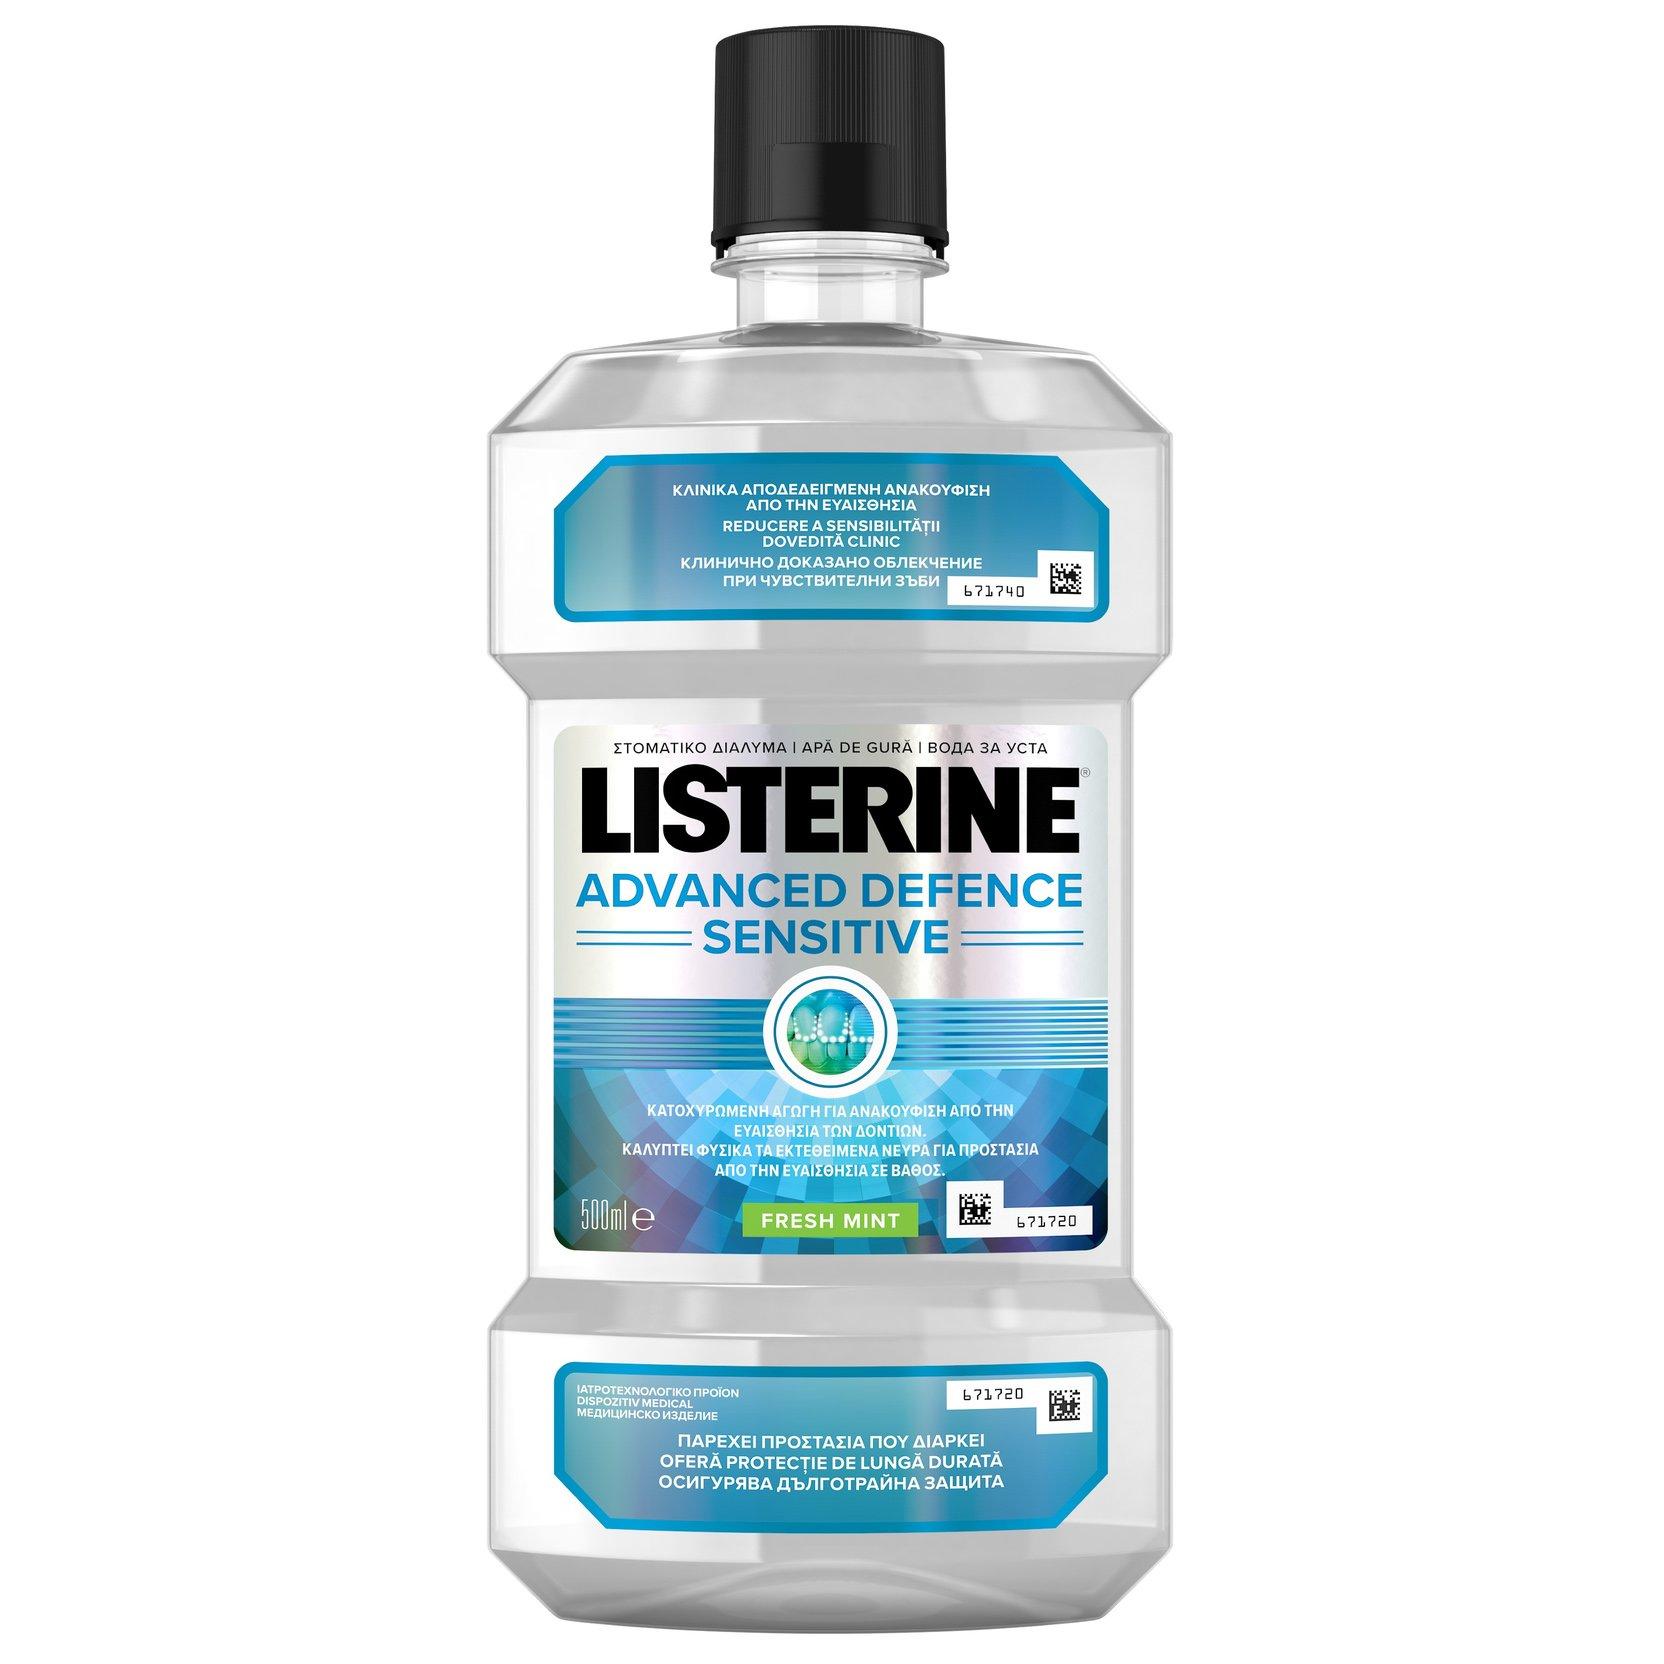 Listerine Advanced Defence Sensitive Στοματικό Διάλυμα για Ανακούφιση από την Ευαισθησία των Δοντιών 500ml